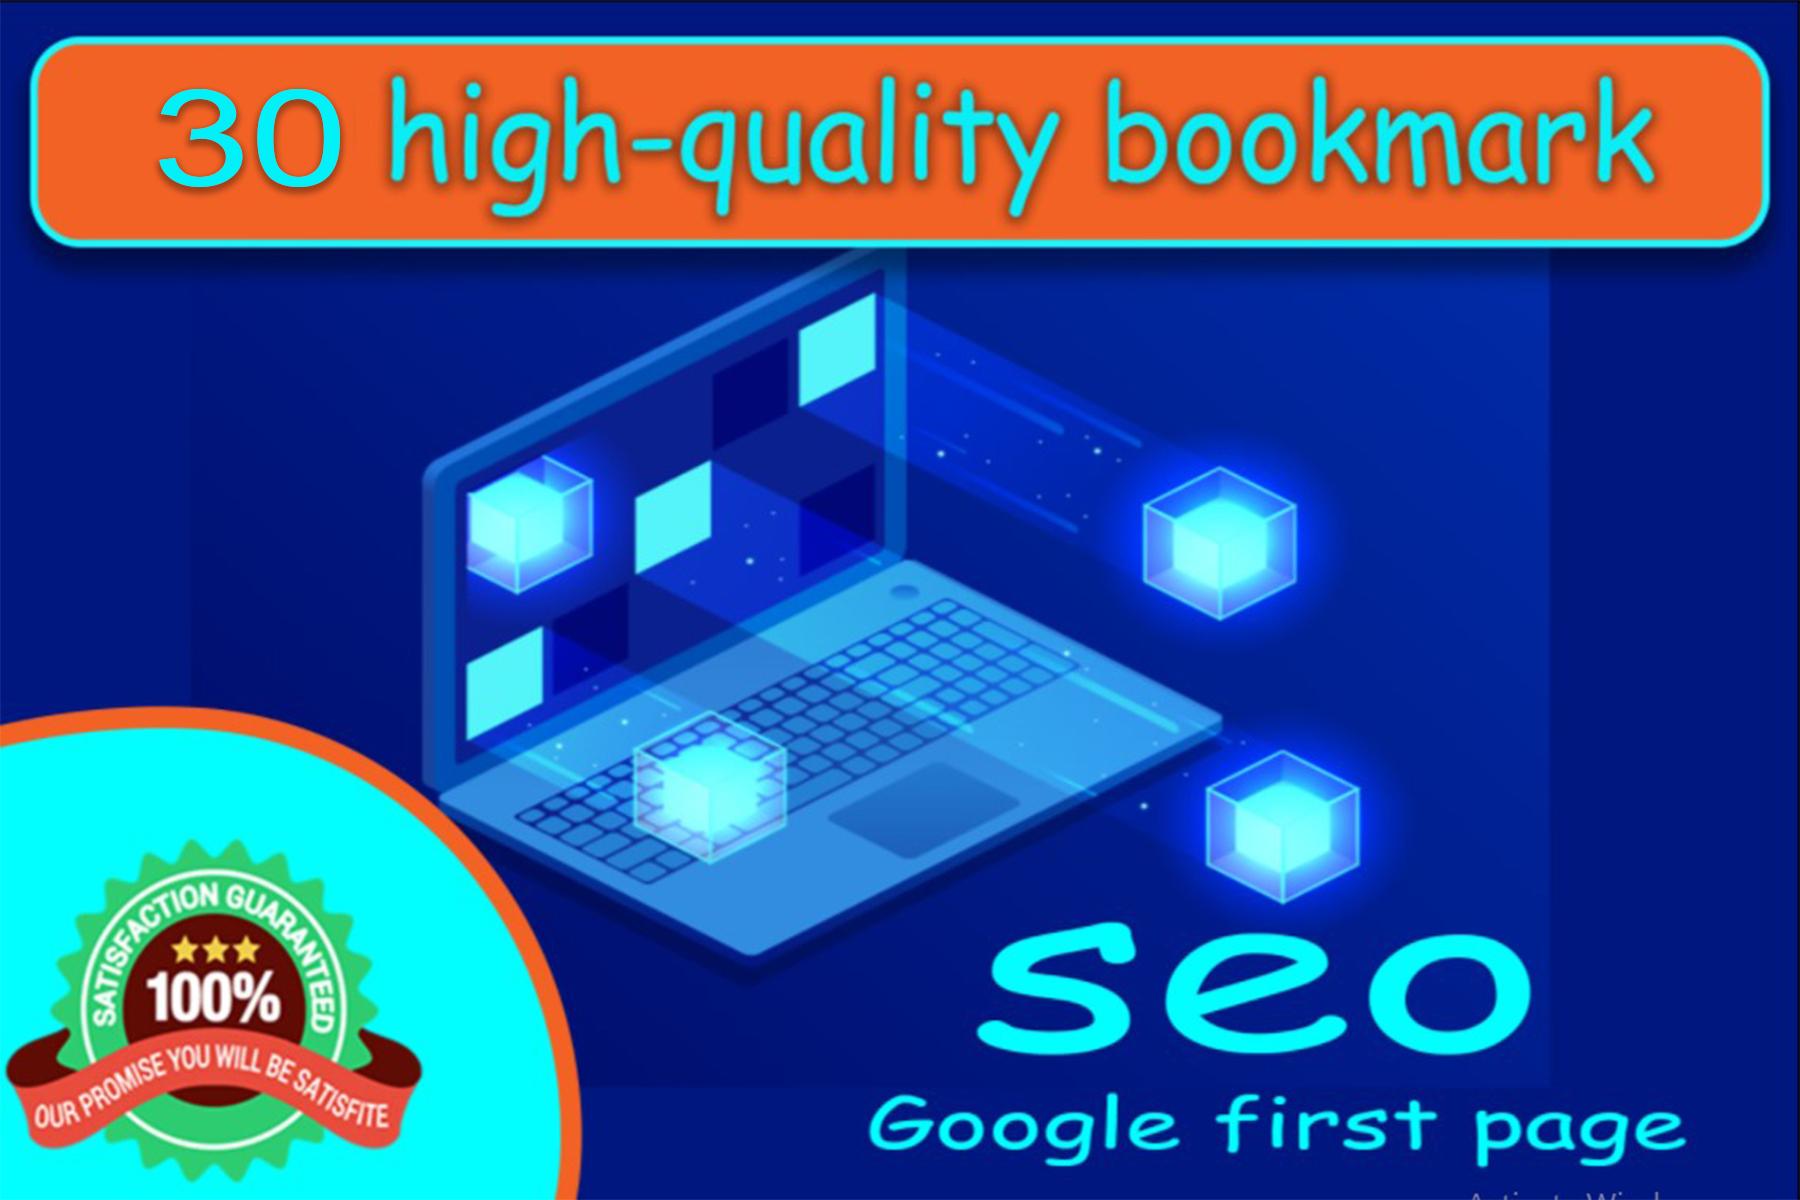 High quality 30 bookmark backlinks post